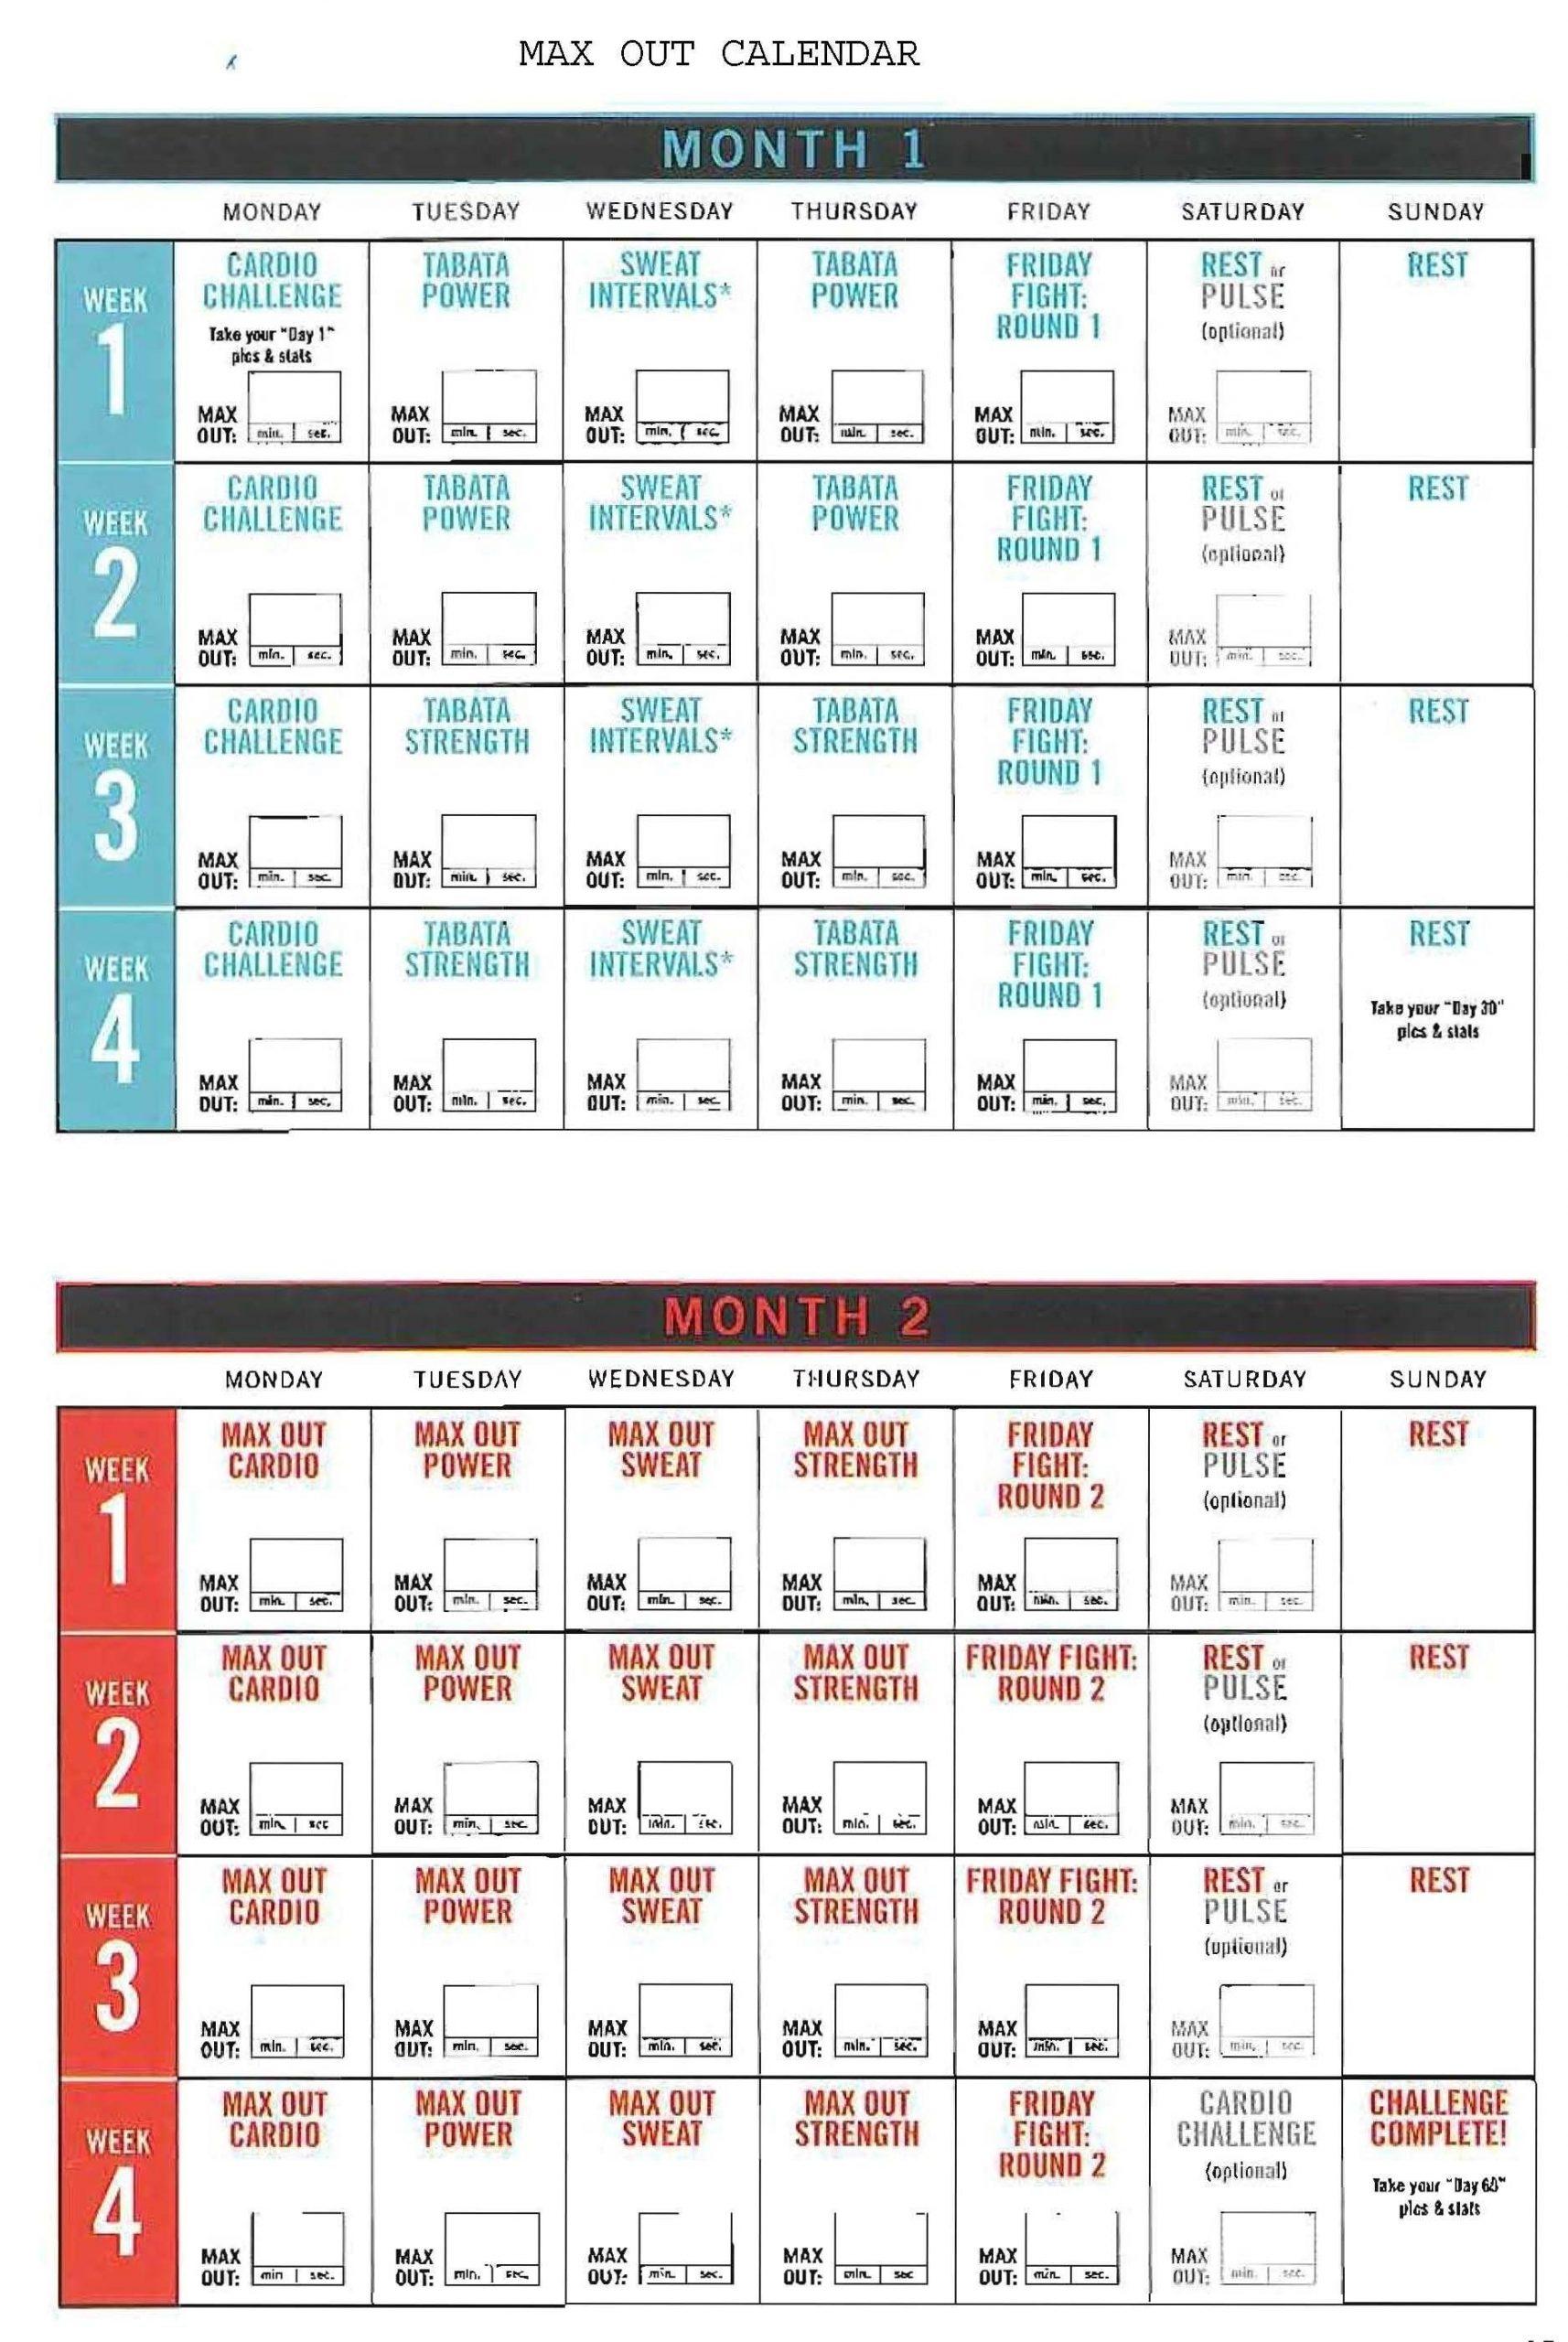 Insanity Max 30 Calendar Pdf | Template Calendar Printable throughout Insanity Max 30 Calendar Pdf